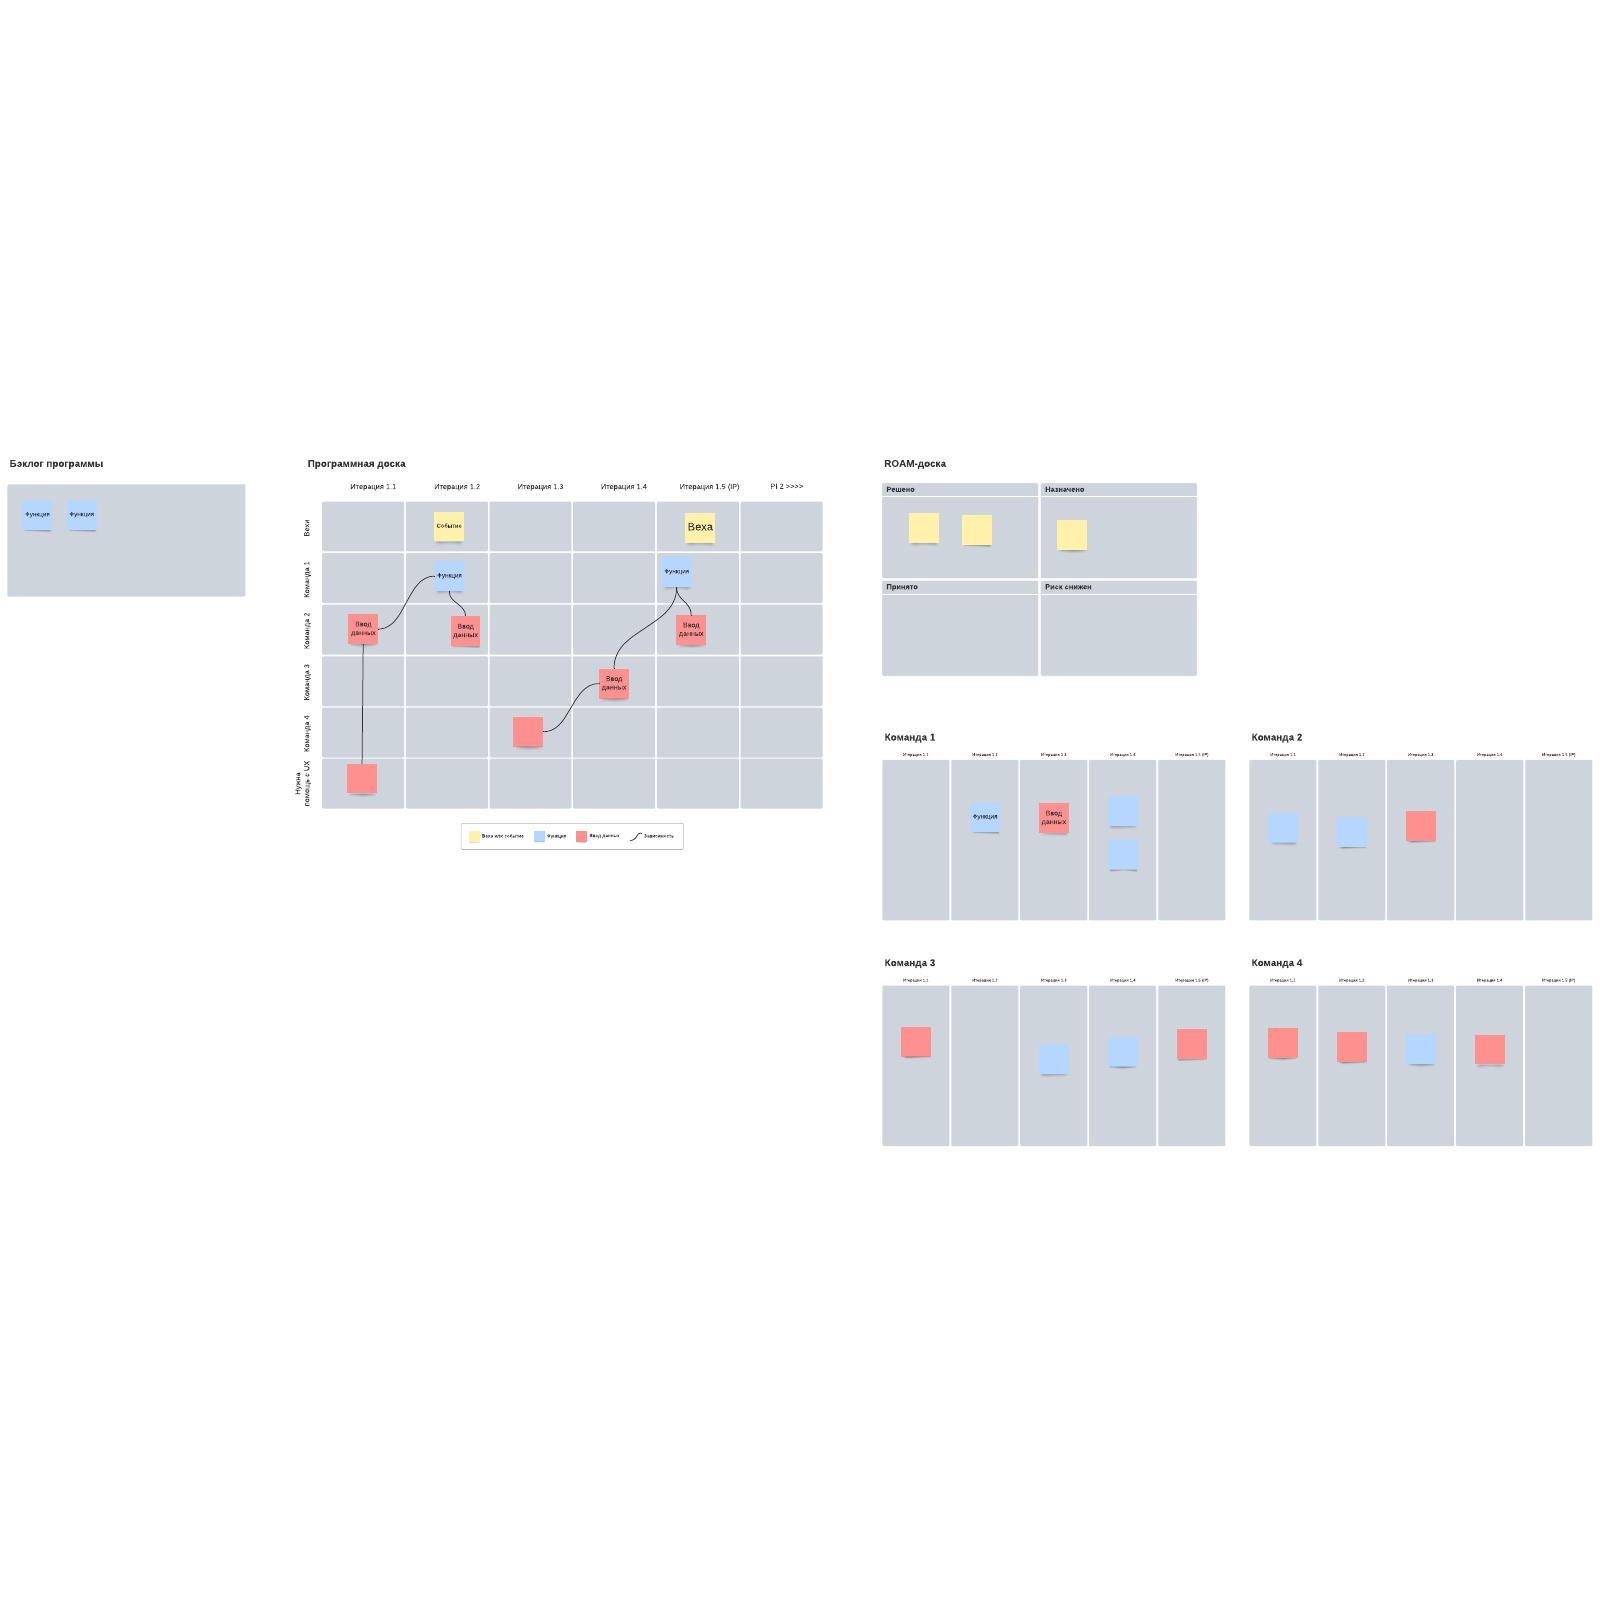 Шаблон для PI-планирования